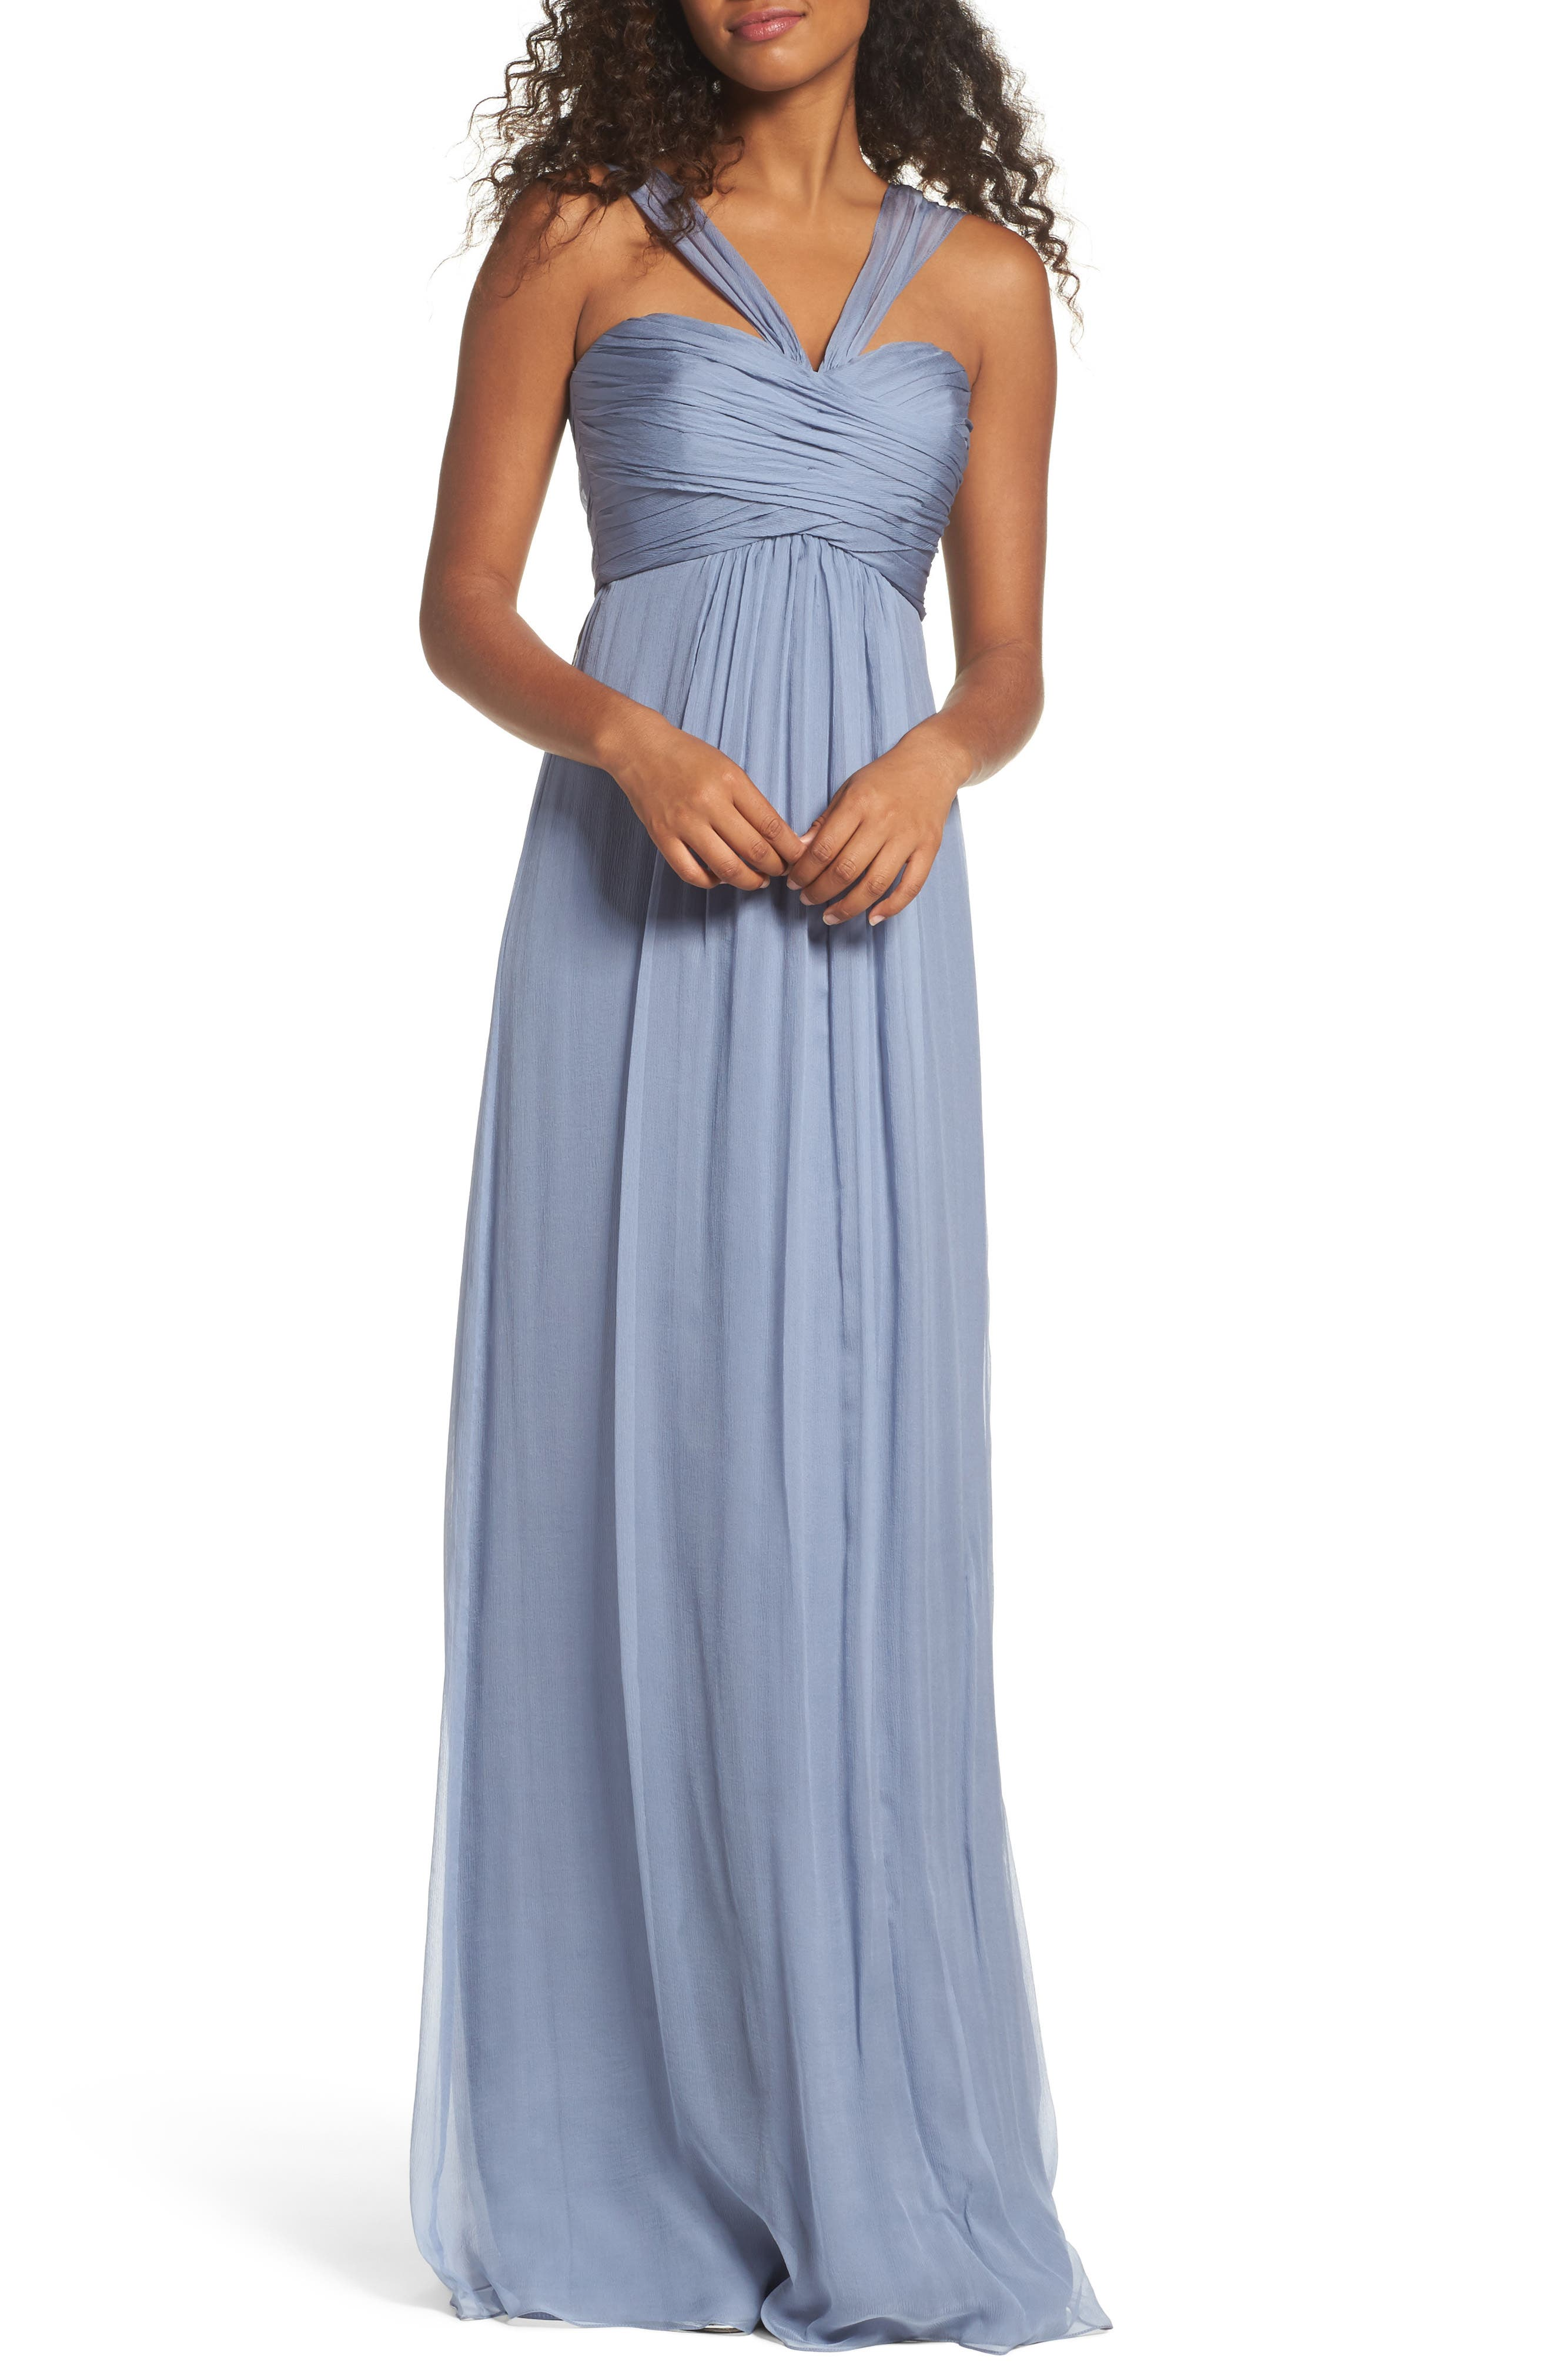 Corbin Crinkled Chiffon Empire Gown,                         Main,                         color,